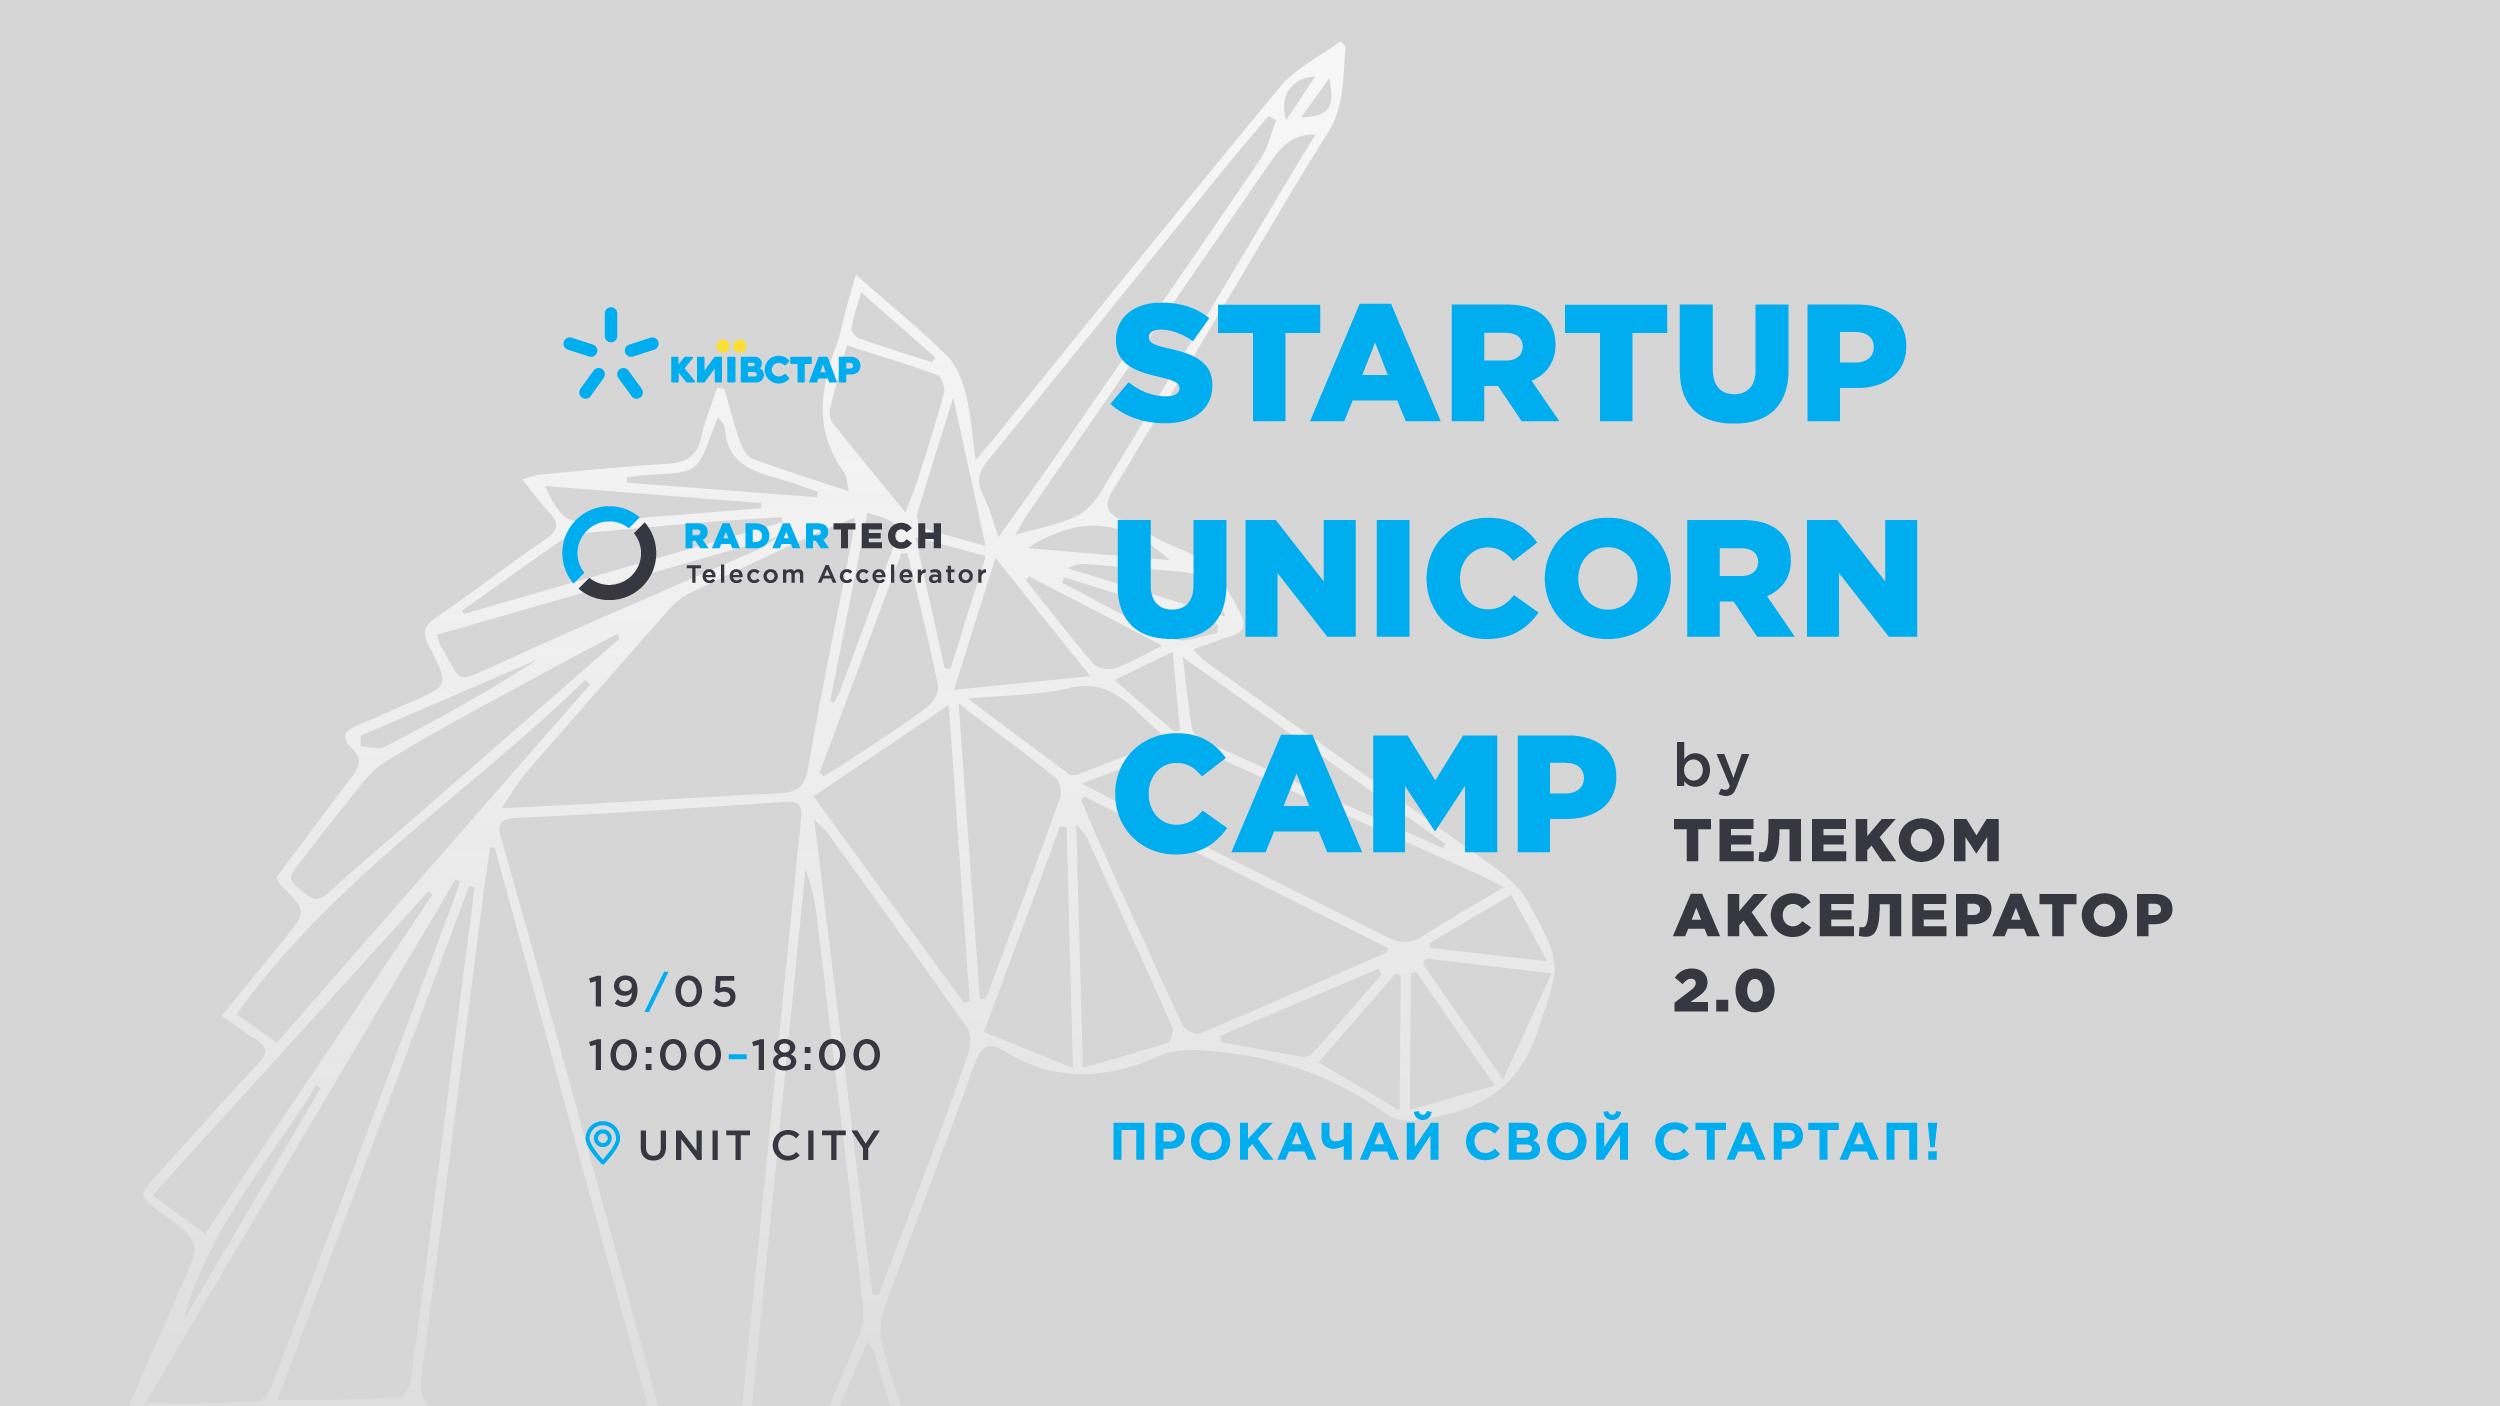 19 мая, Киев, Startup Unicorn Camp by Телеком-акселератор 2.0